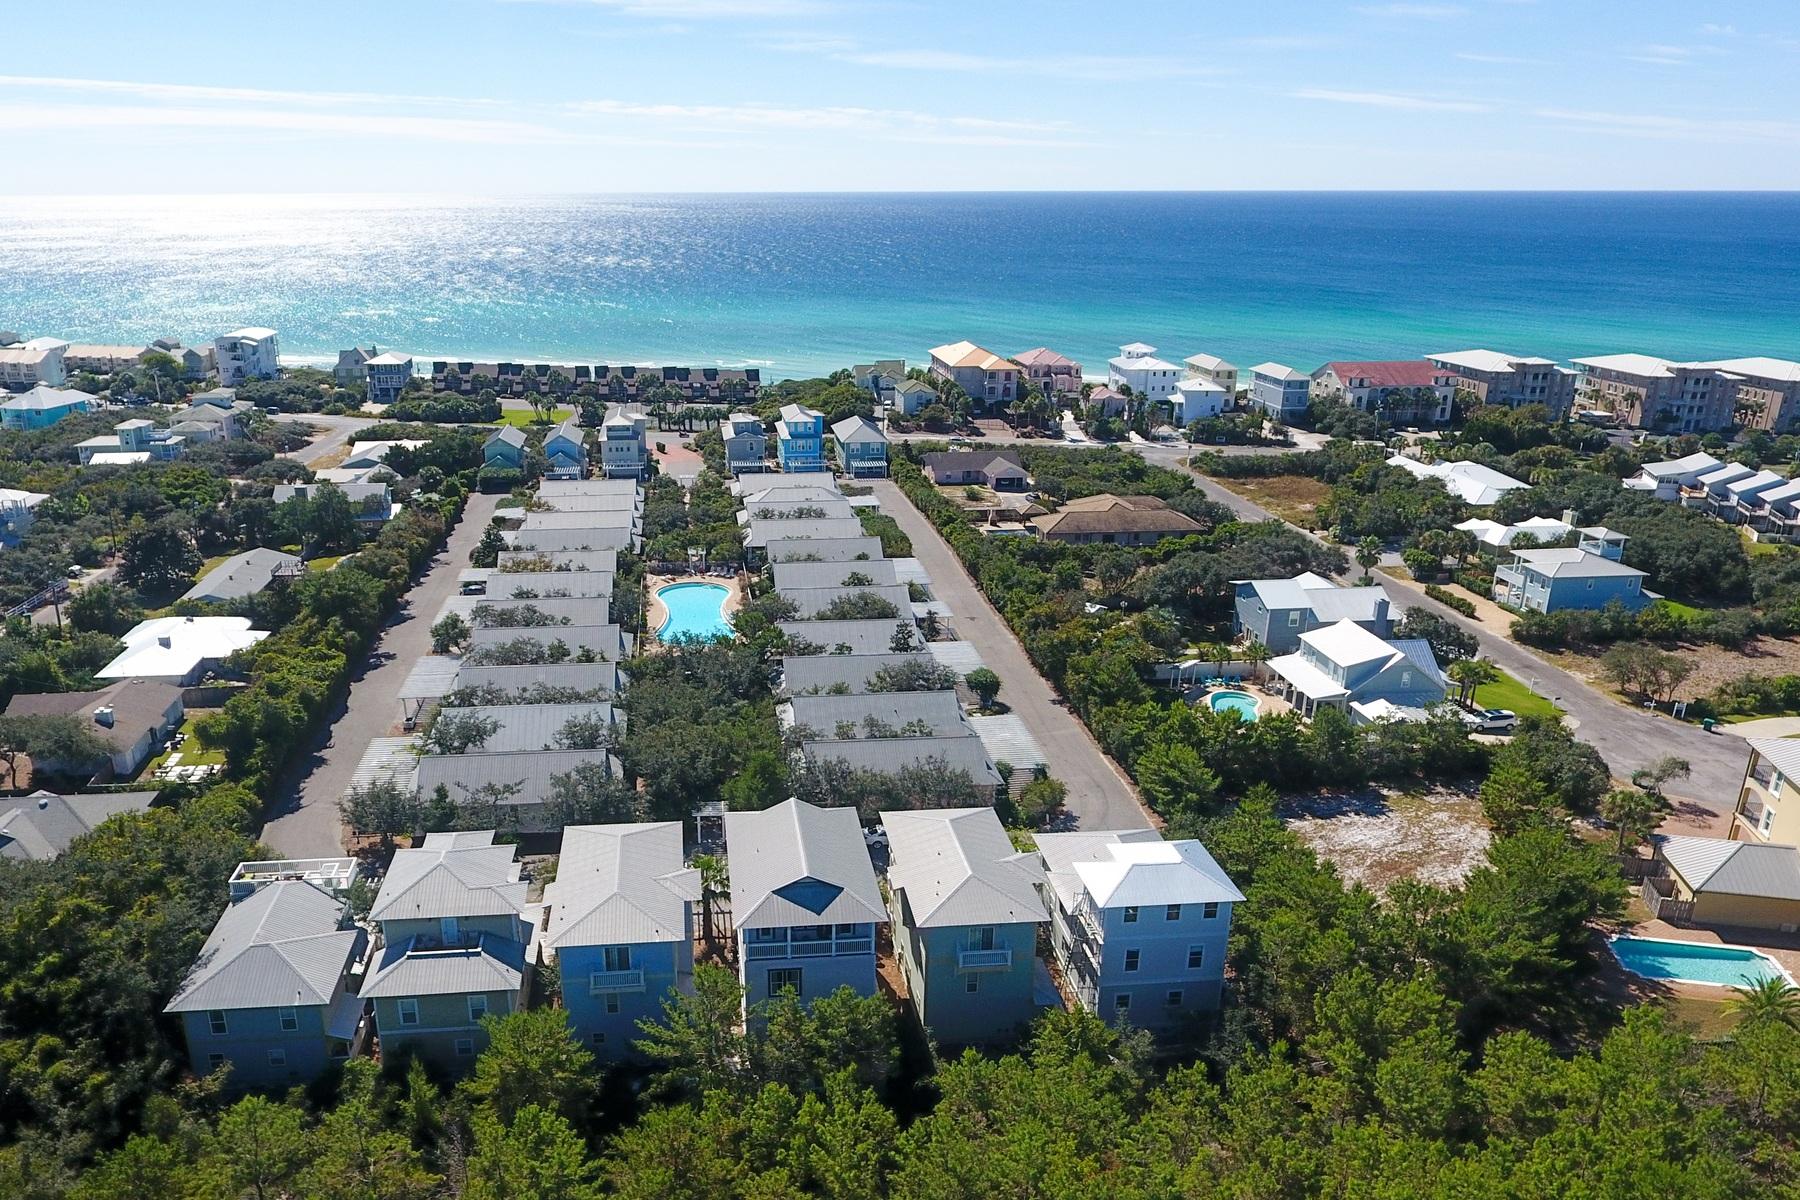 Moradia para Venda às INVITING COTTAGE WITH THIRD FLOOR GULF VIEWS 144 Cottage Way Seacrest, Florida, 32461 Estados Unidos